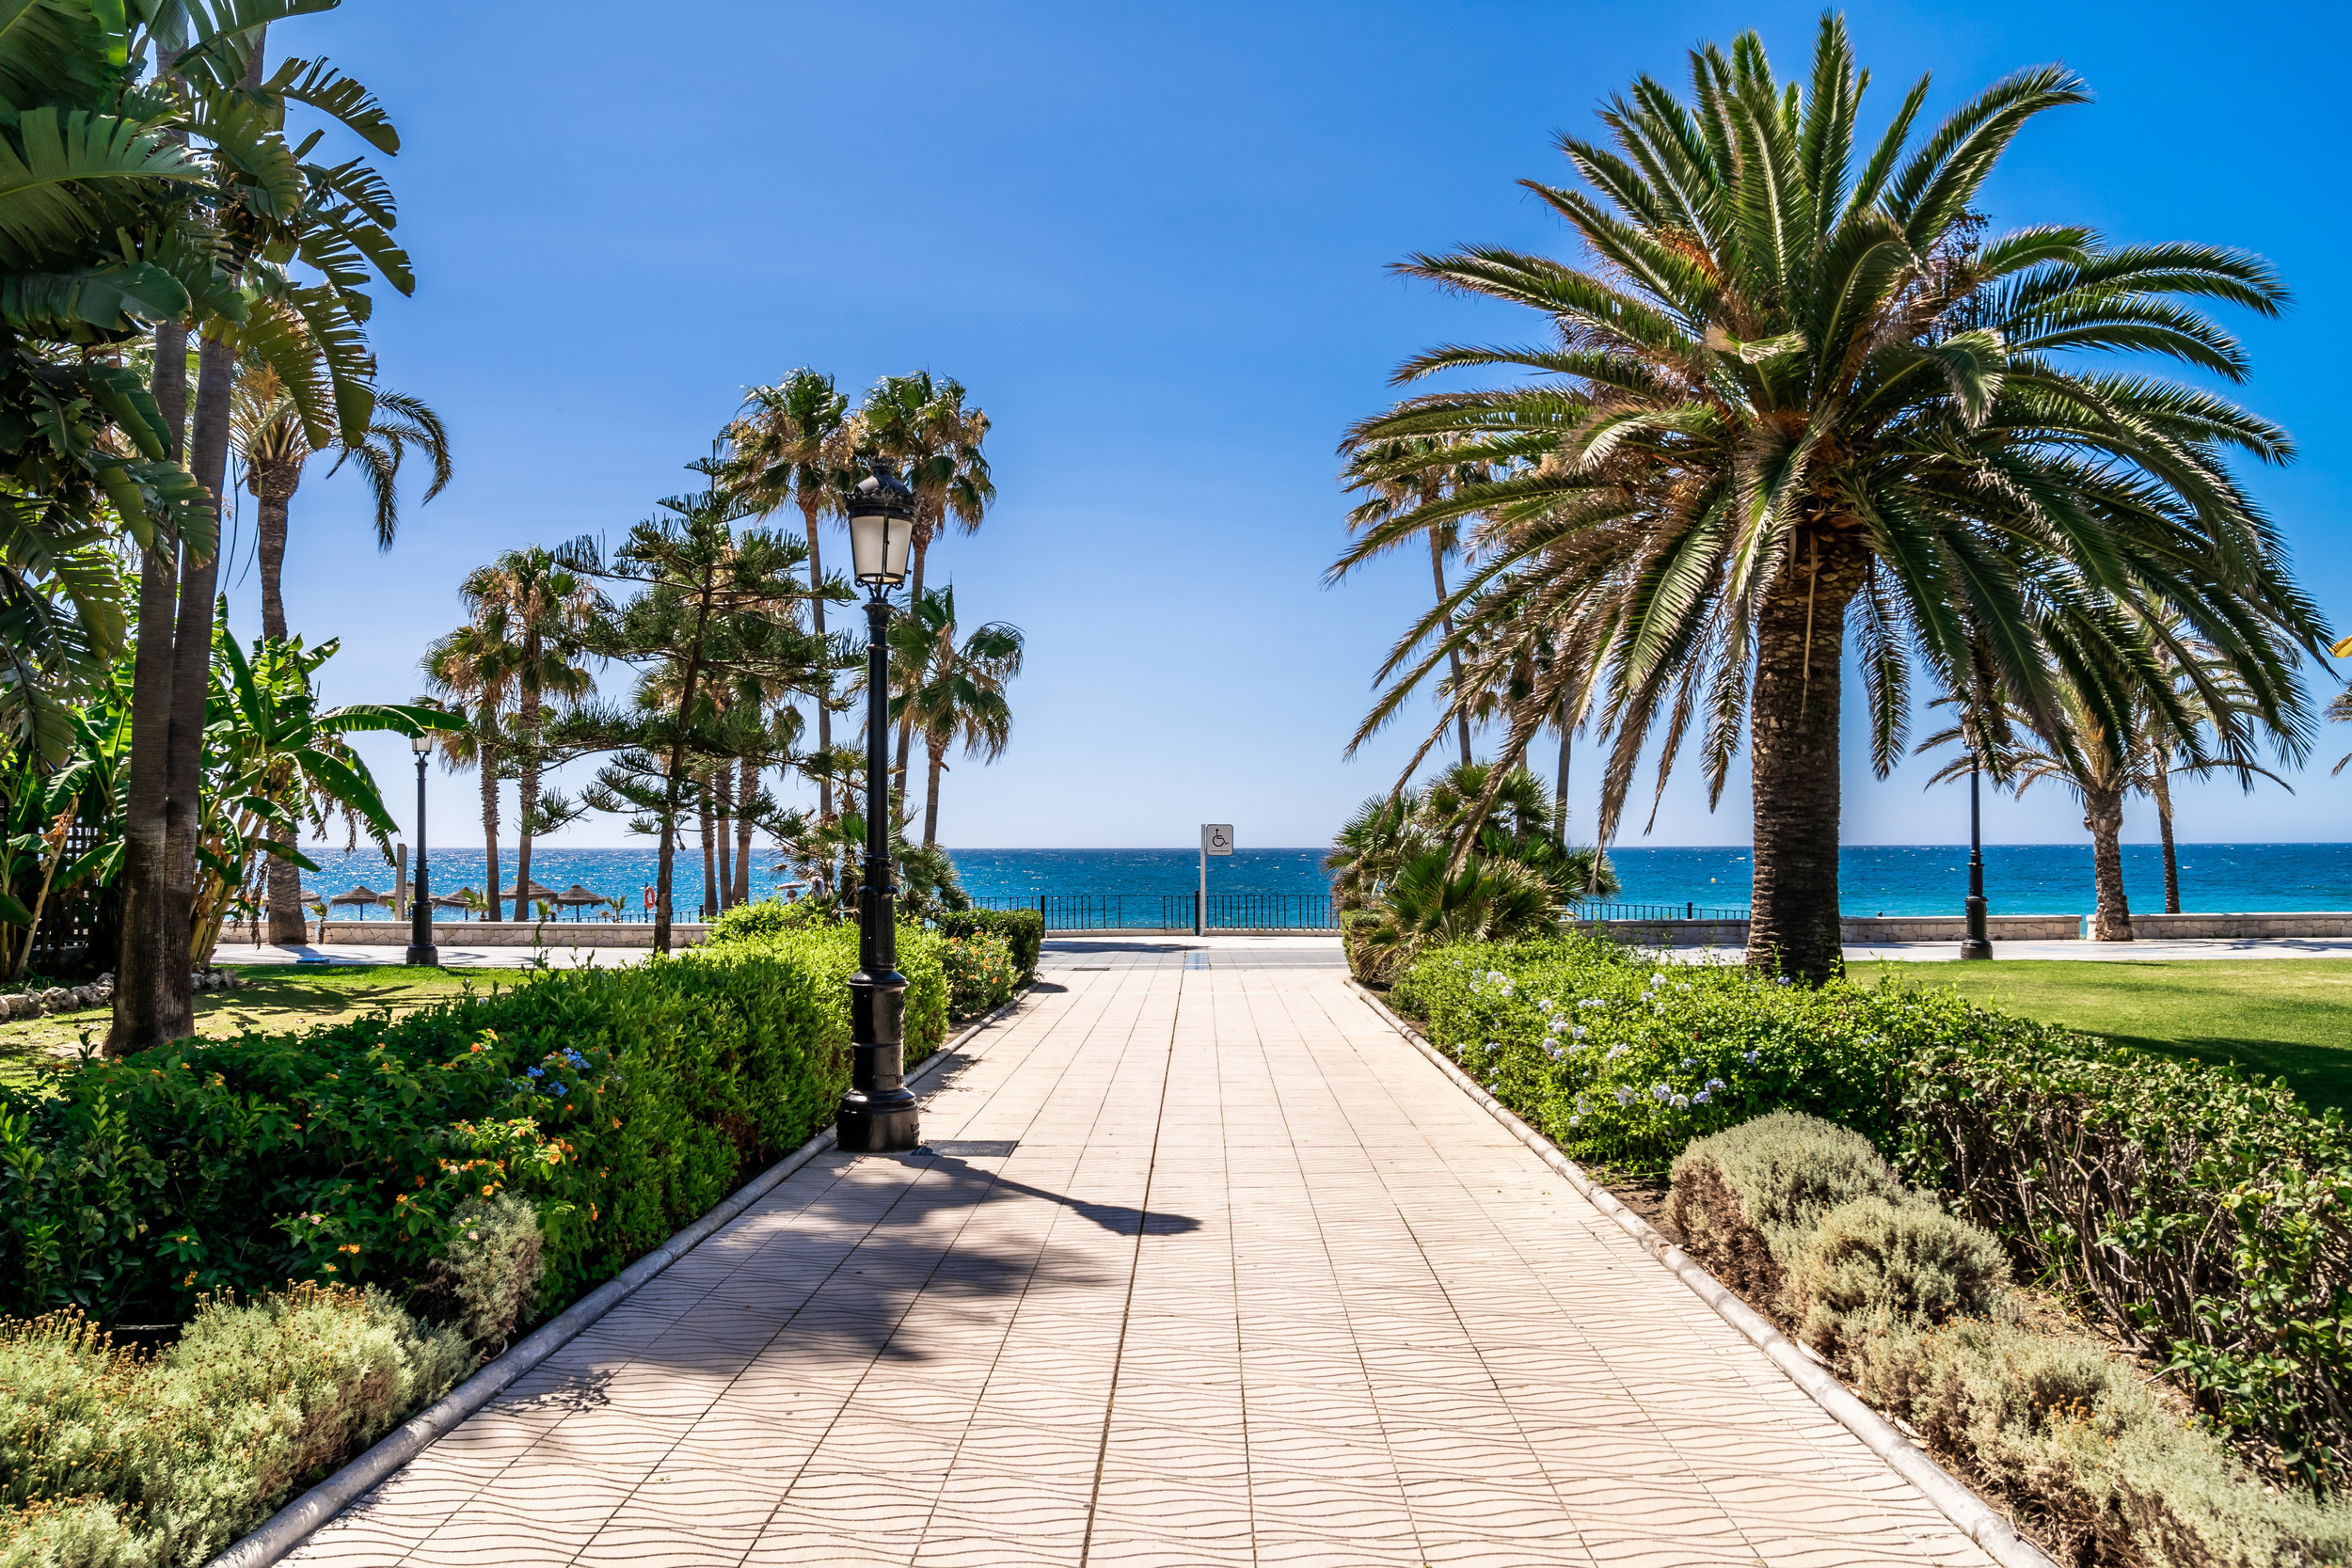 San Pedro de Alcantara playa